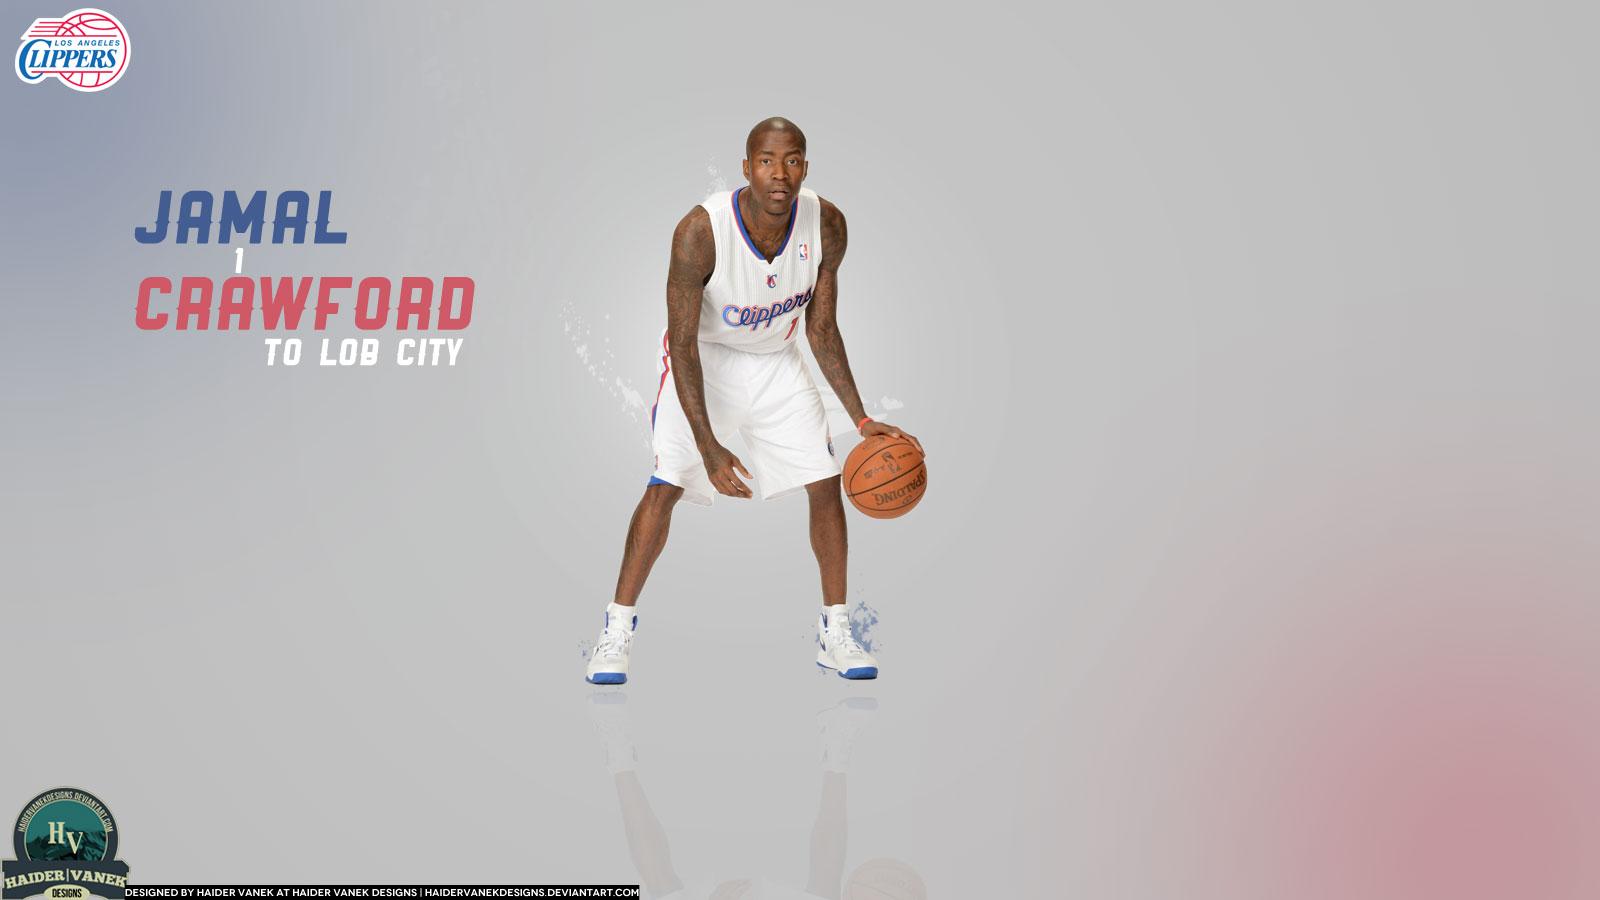 a70ffd93a Jamal Crawford LA Clippers 2012 1600x900 Wallpaper